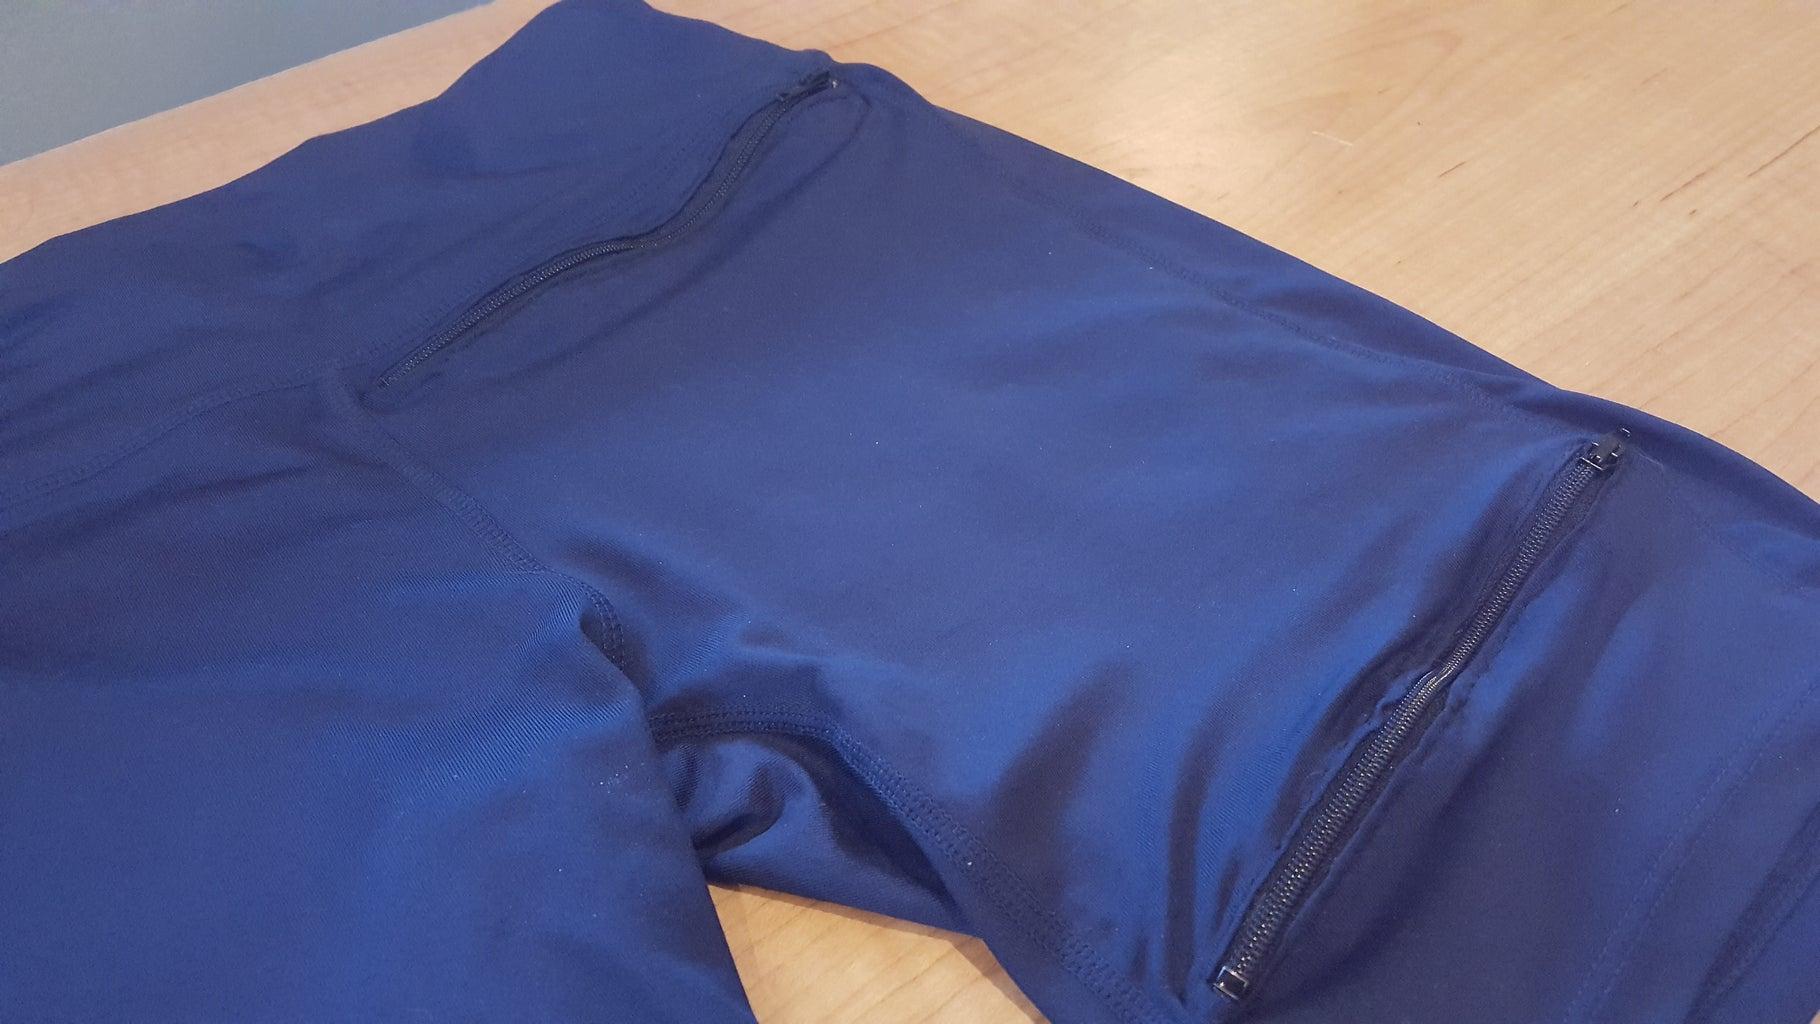 Sew the Finishing Seam on the Bottom Zipper